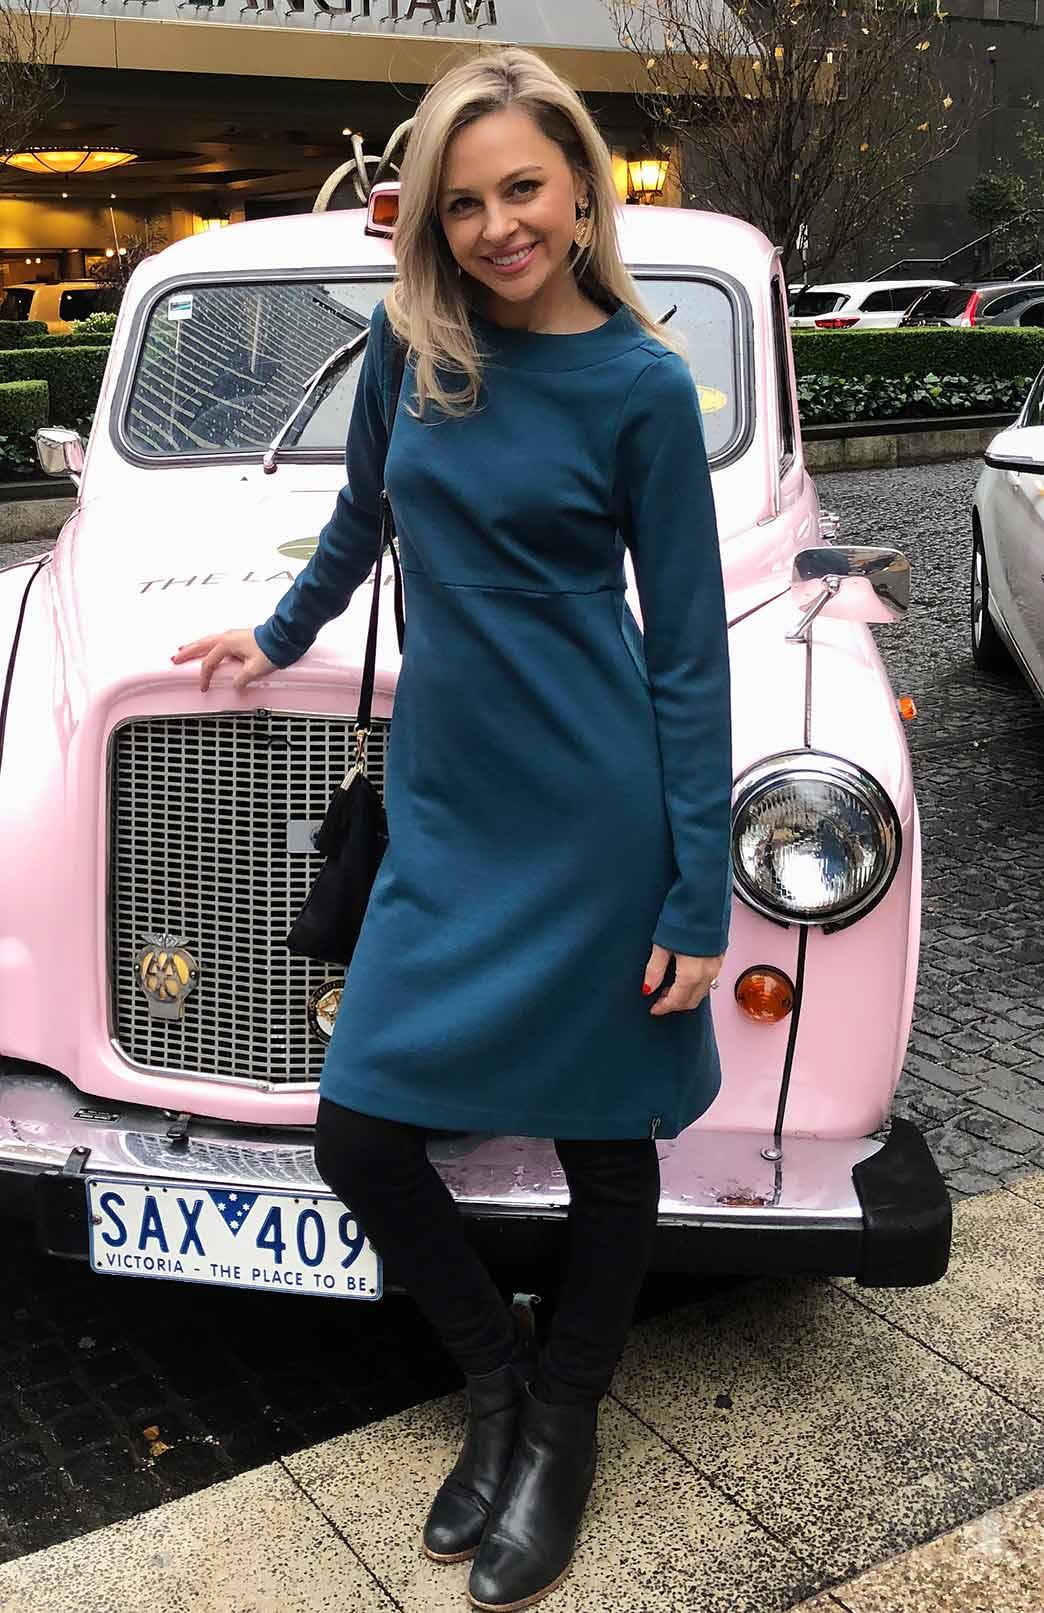 Sascha Straight Dress - Women's Superfine Merino Wool Teal Long Sleeved Heavyweight Winter Dress - Smitten Merino Tasmania Australia